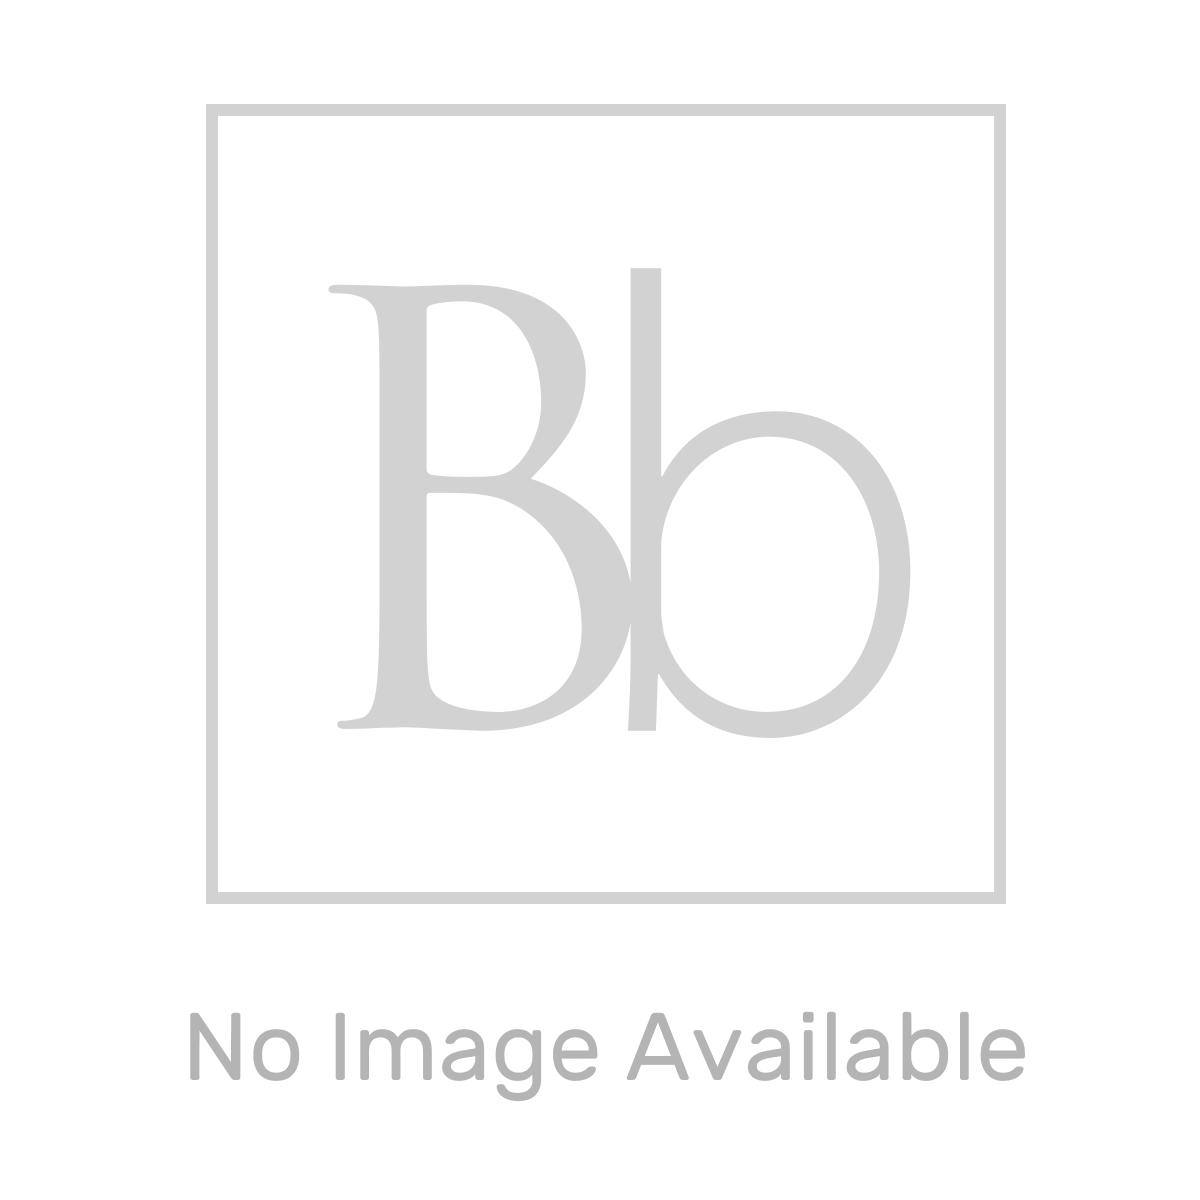 Zenith Spendo Bath Shower Mixer Tap